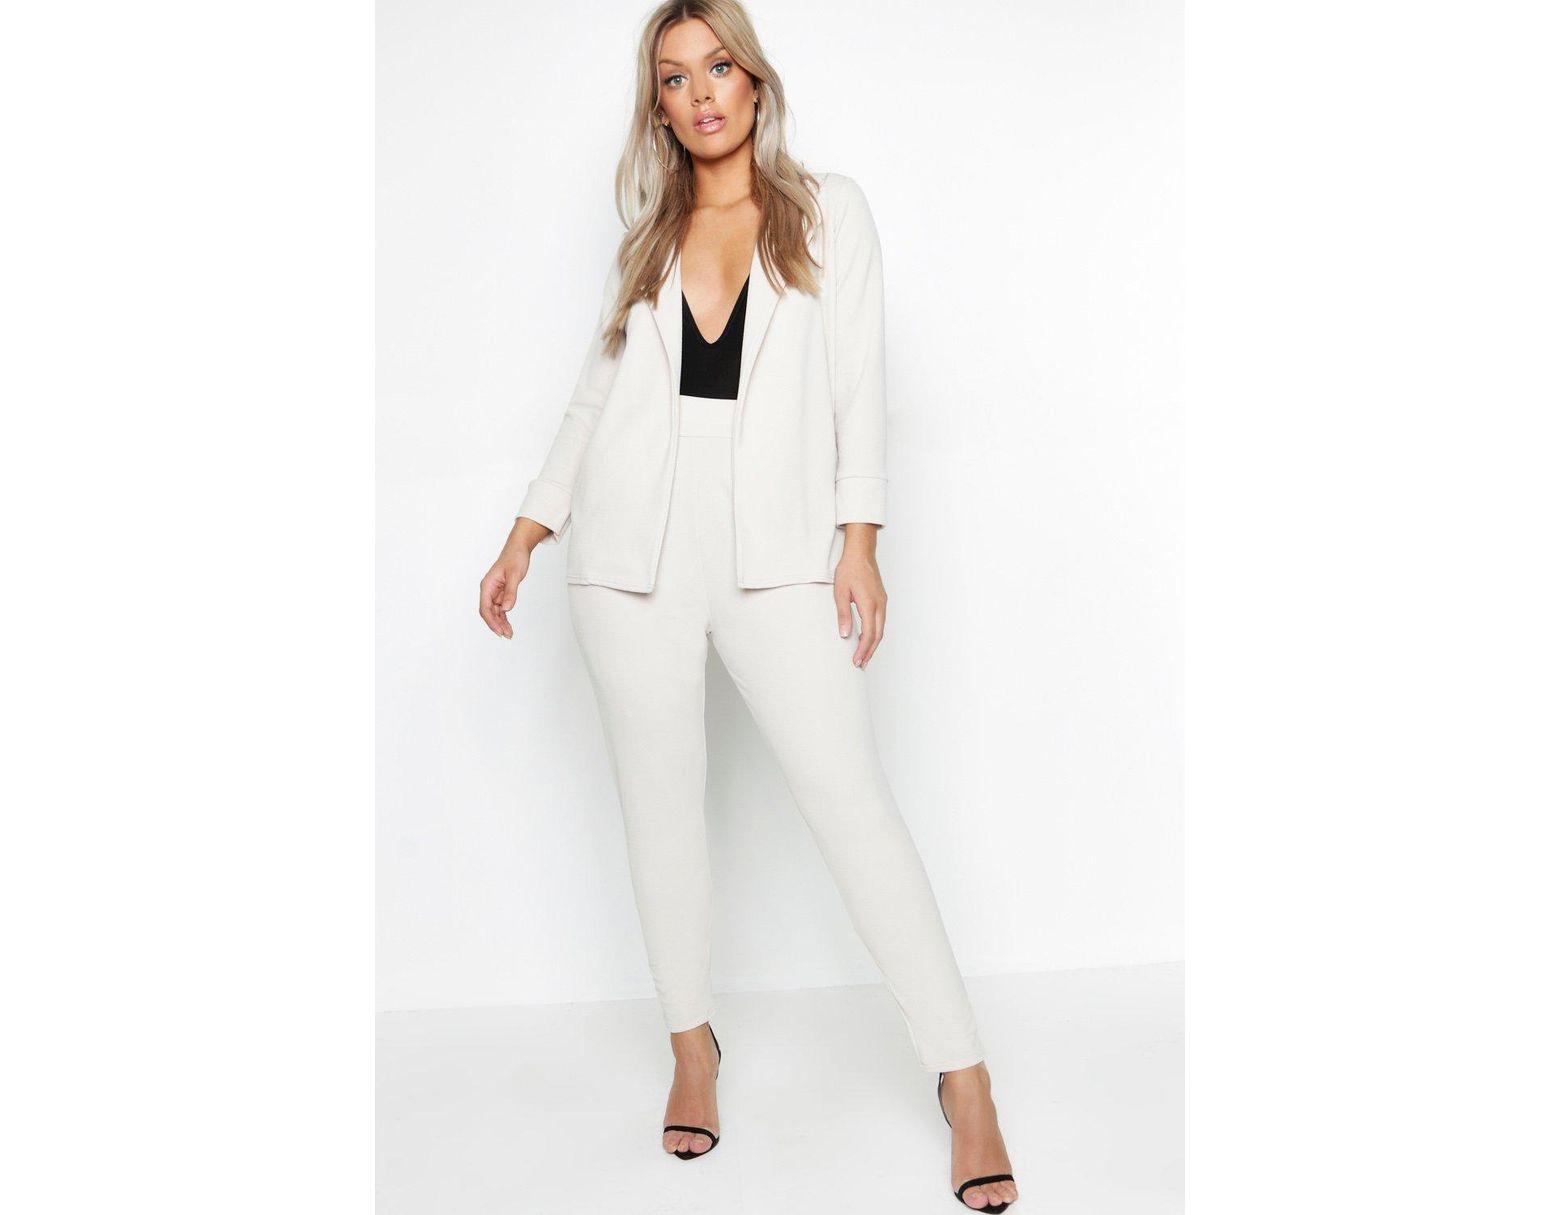 ce15cbe06c48 Boohoo Plus Blazer & Pants Suit Co-ord in White - Lyst